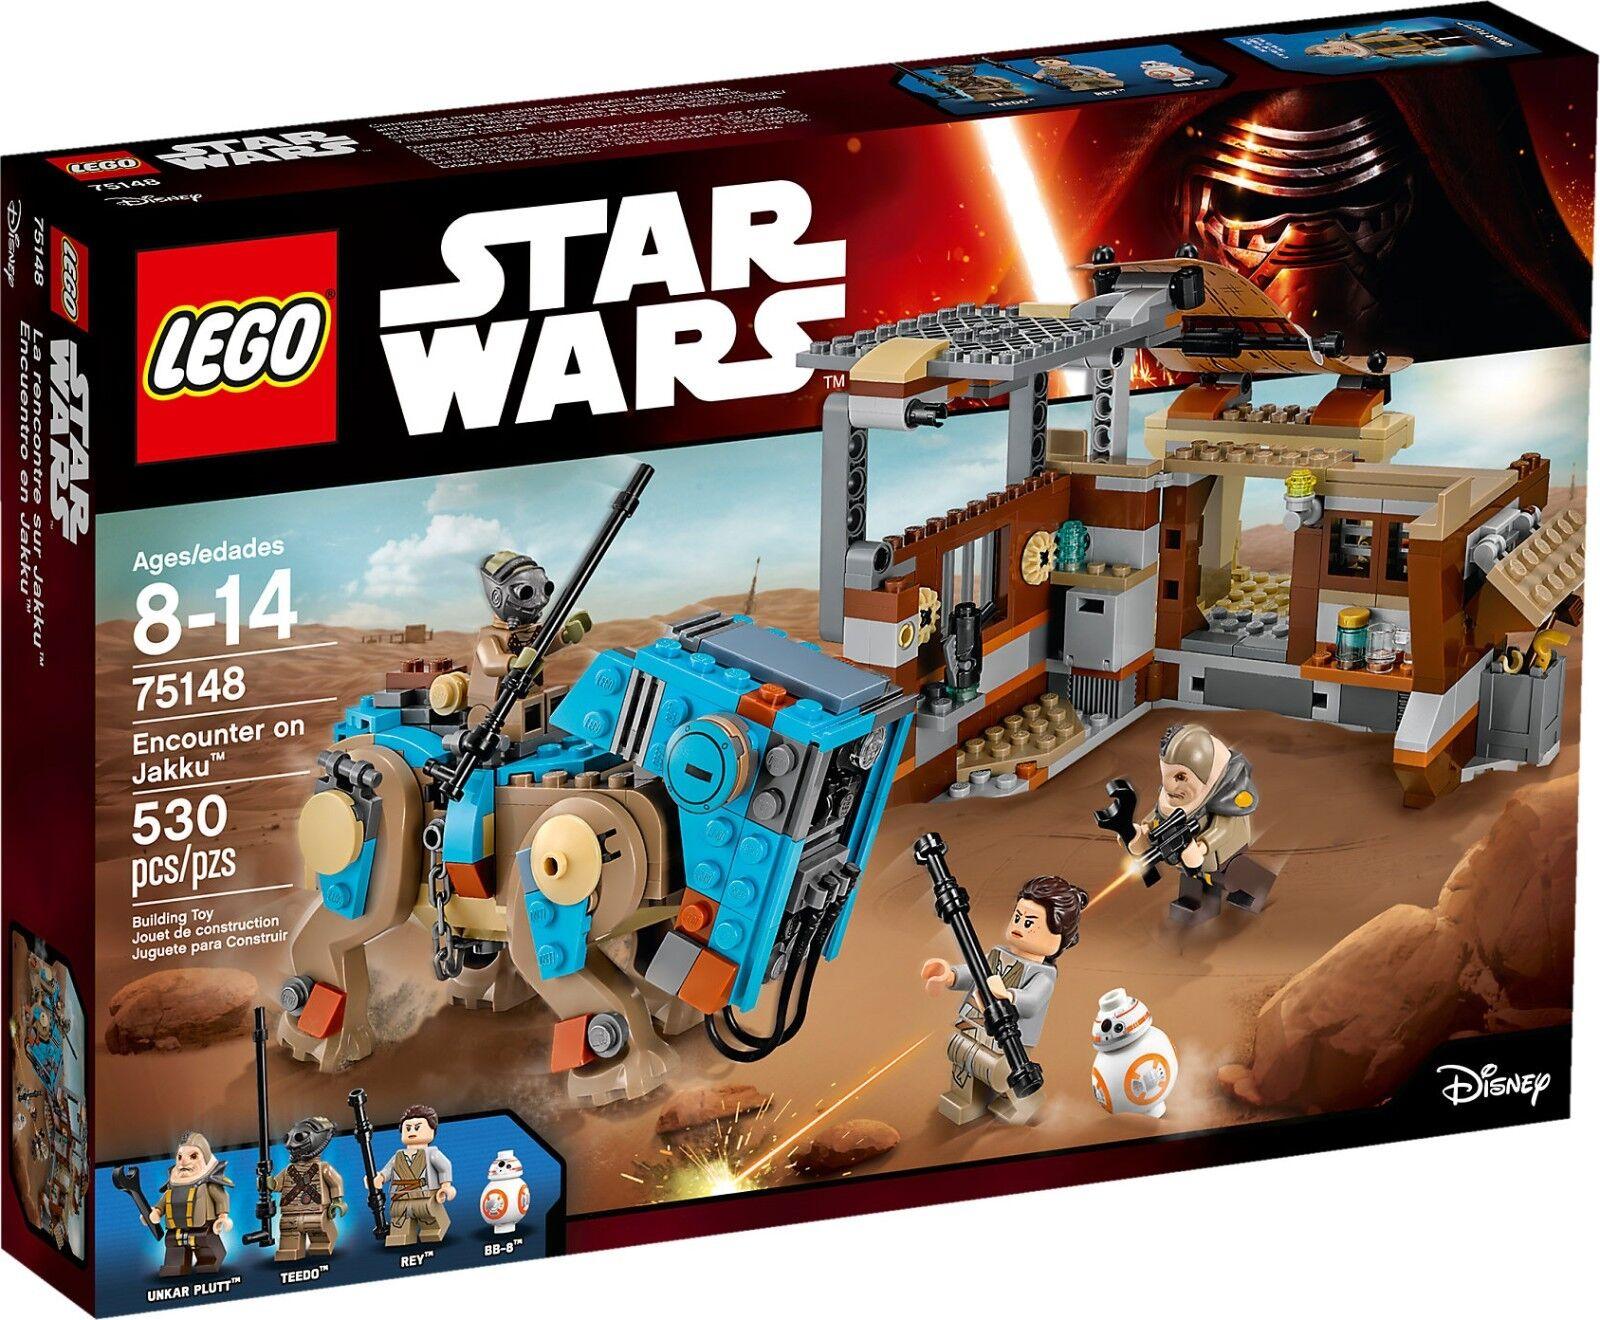 LEGO STAR WARS 75148 INCONTRO SU JAKKU NUOVO NEW NEW NEW 68f5d2